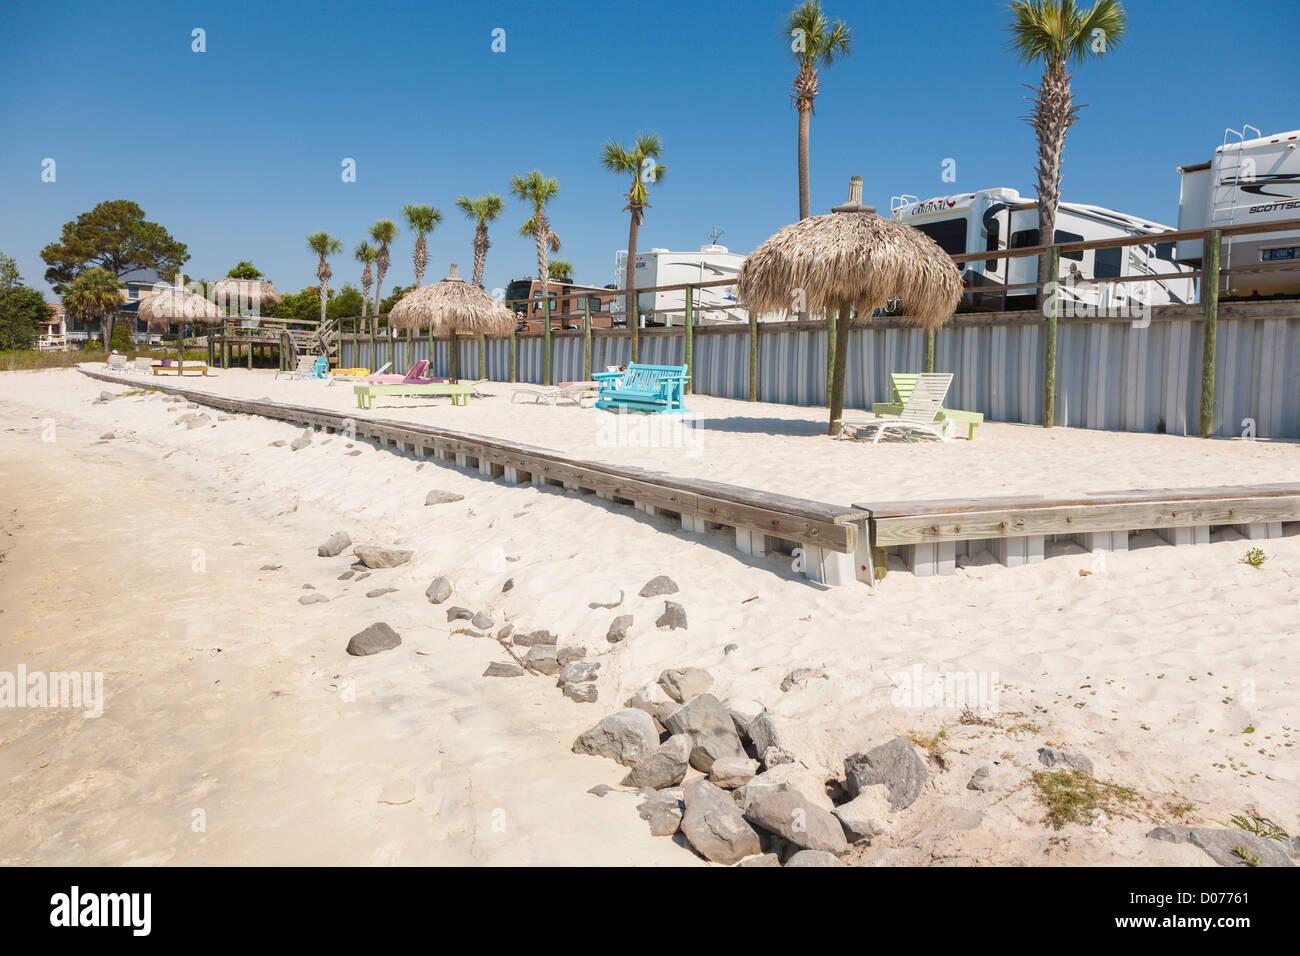 Private beach at waterfront RV resort on Santa Rosa Sound in Navarre, Florida - Stock Image